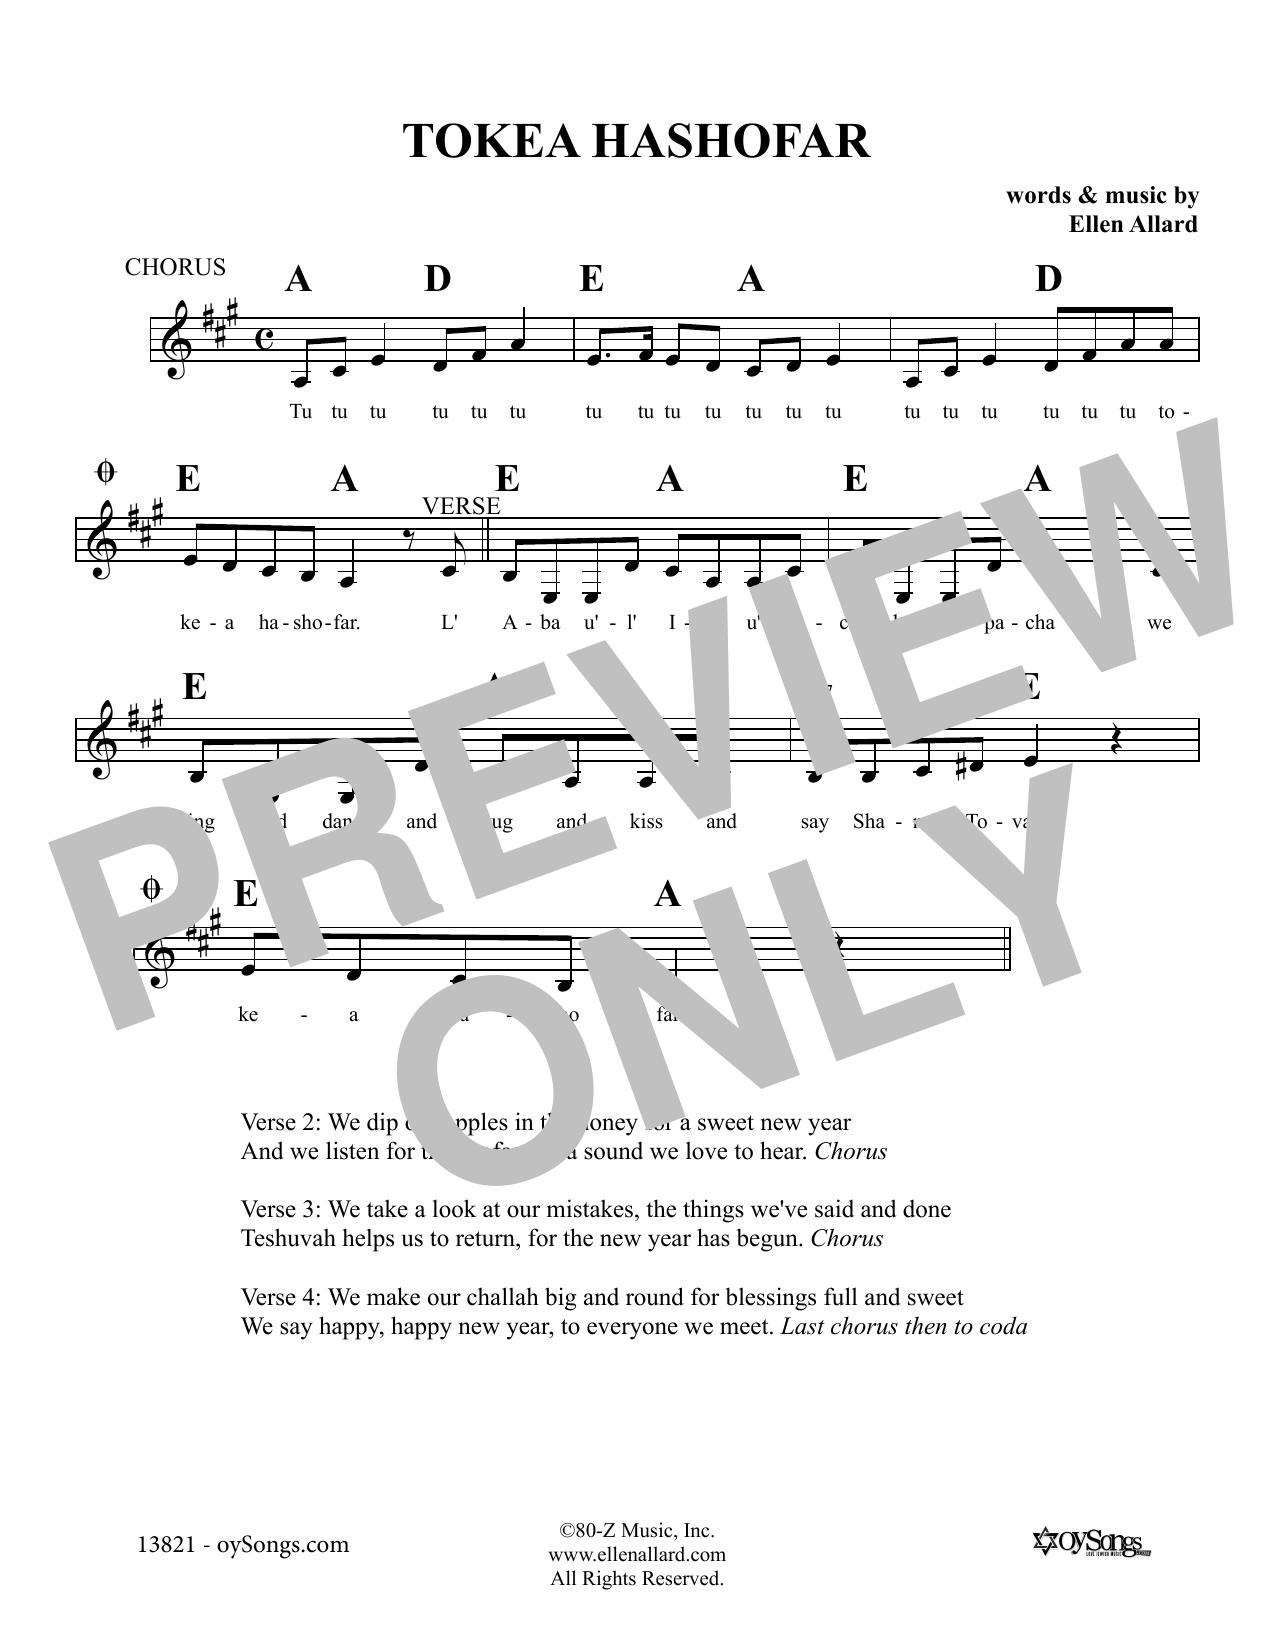 Ellen Allard Tokei'a Hashofar sheet music notes and chords. Download Printable PDF.